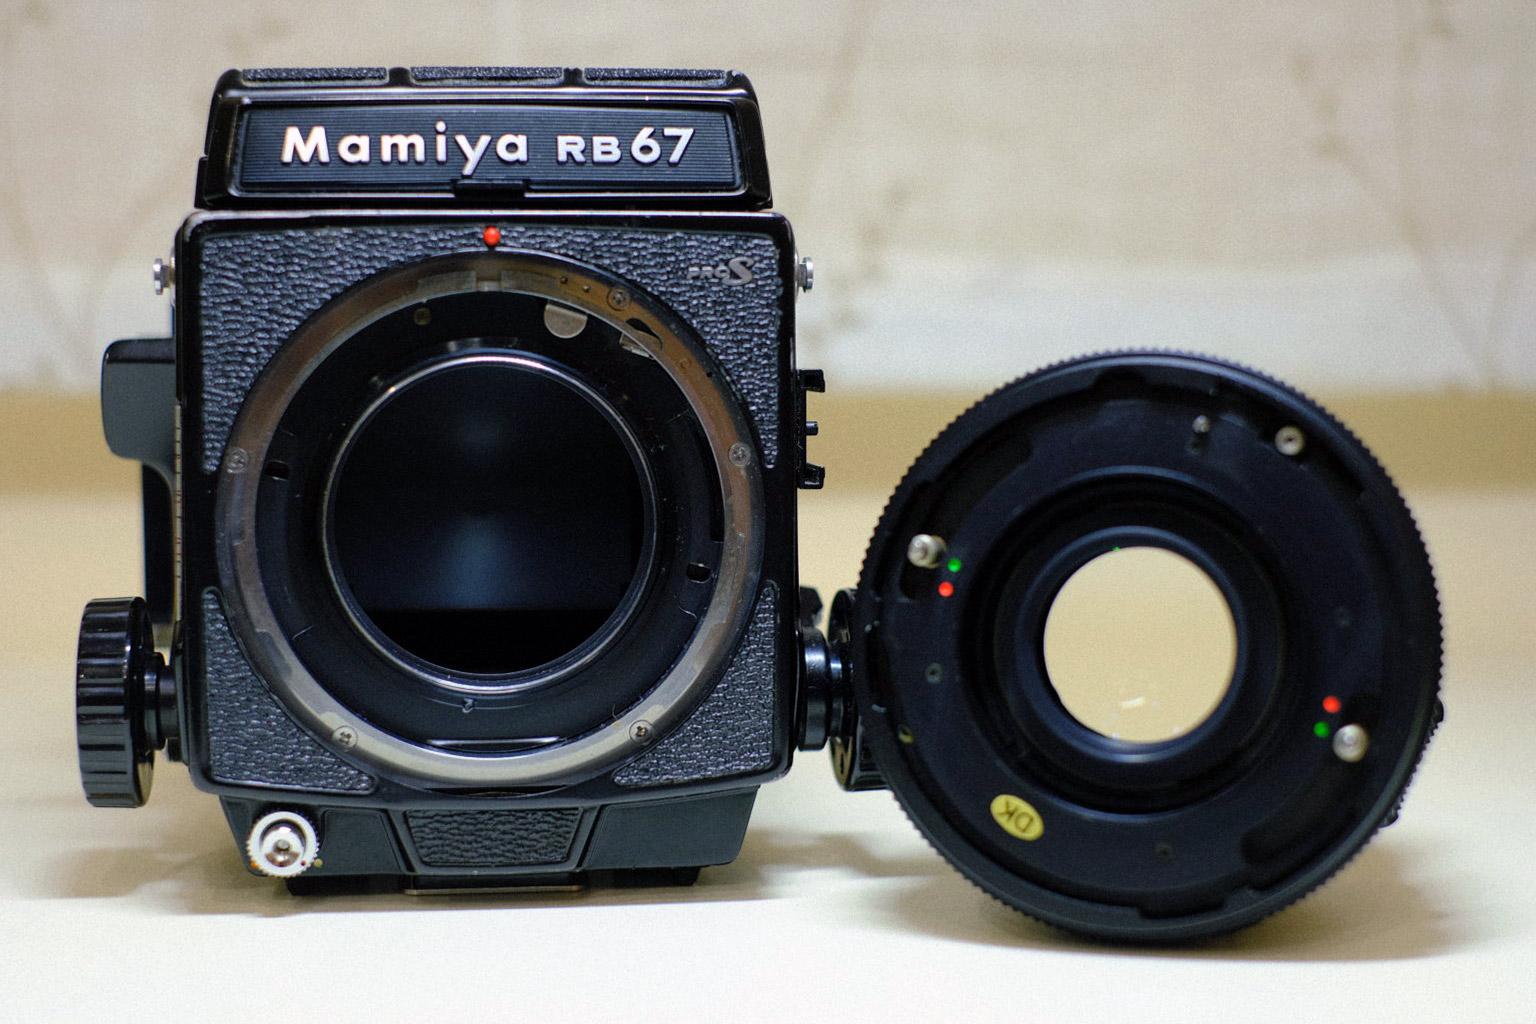 Mamiya RB67 PROFESSIONAL S 6×8電動フィルムパック/SEKOR C 127mm f3.8